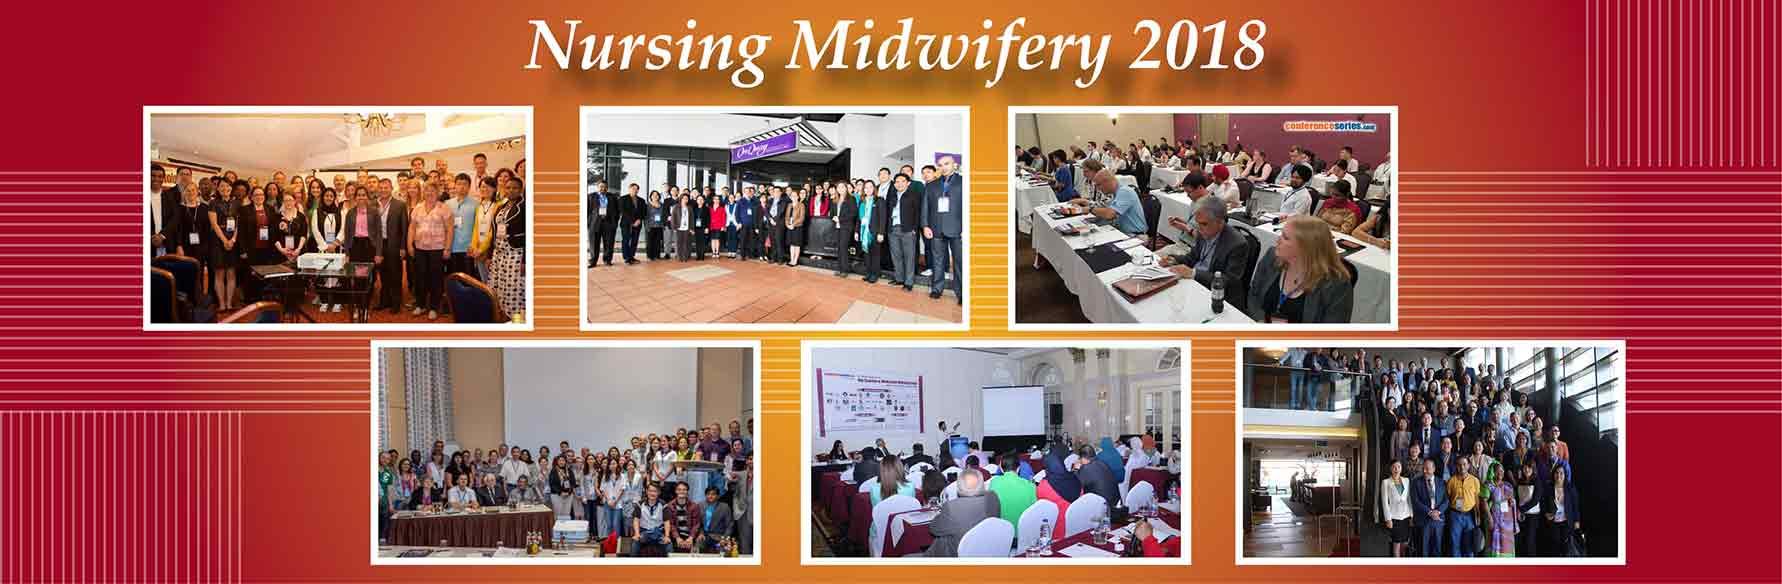 - Nursing Midwifery 2018